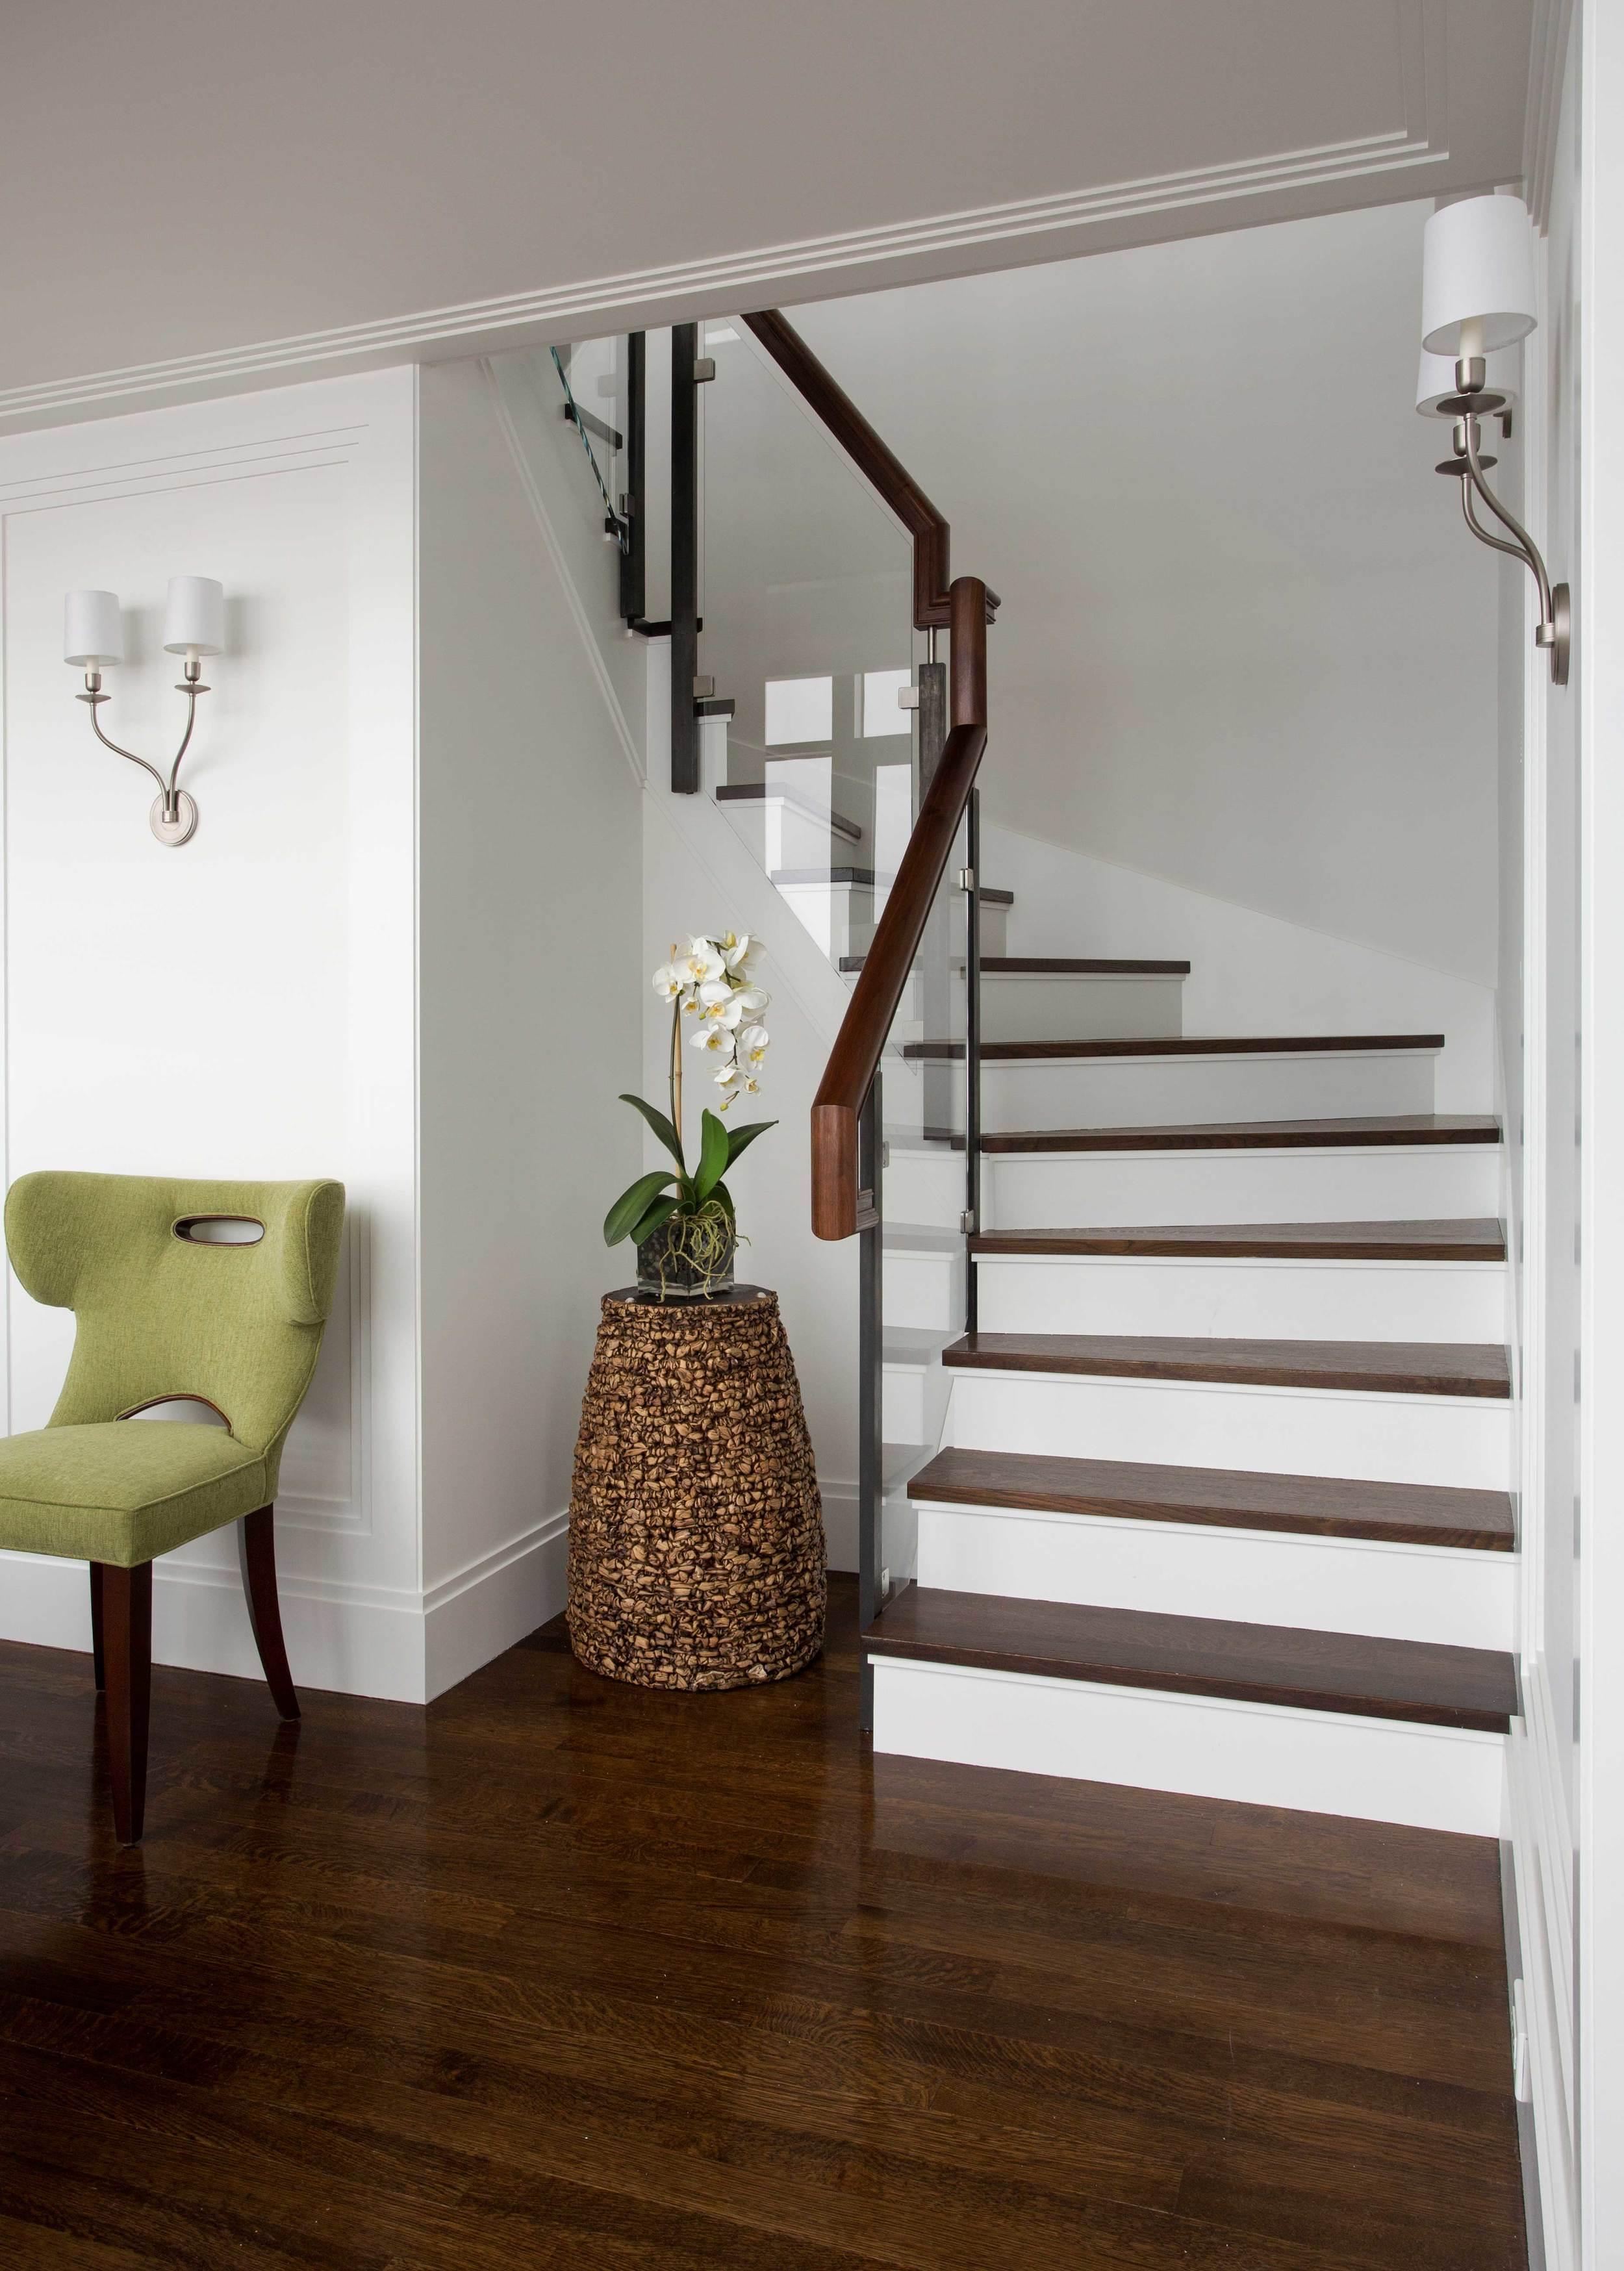 18a-Angus-Beasley--2-14-stairs-1.jpg